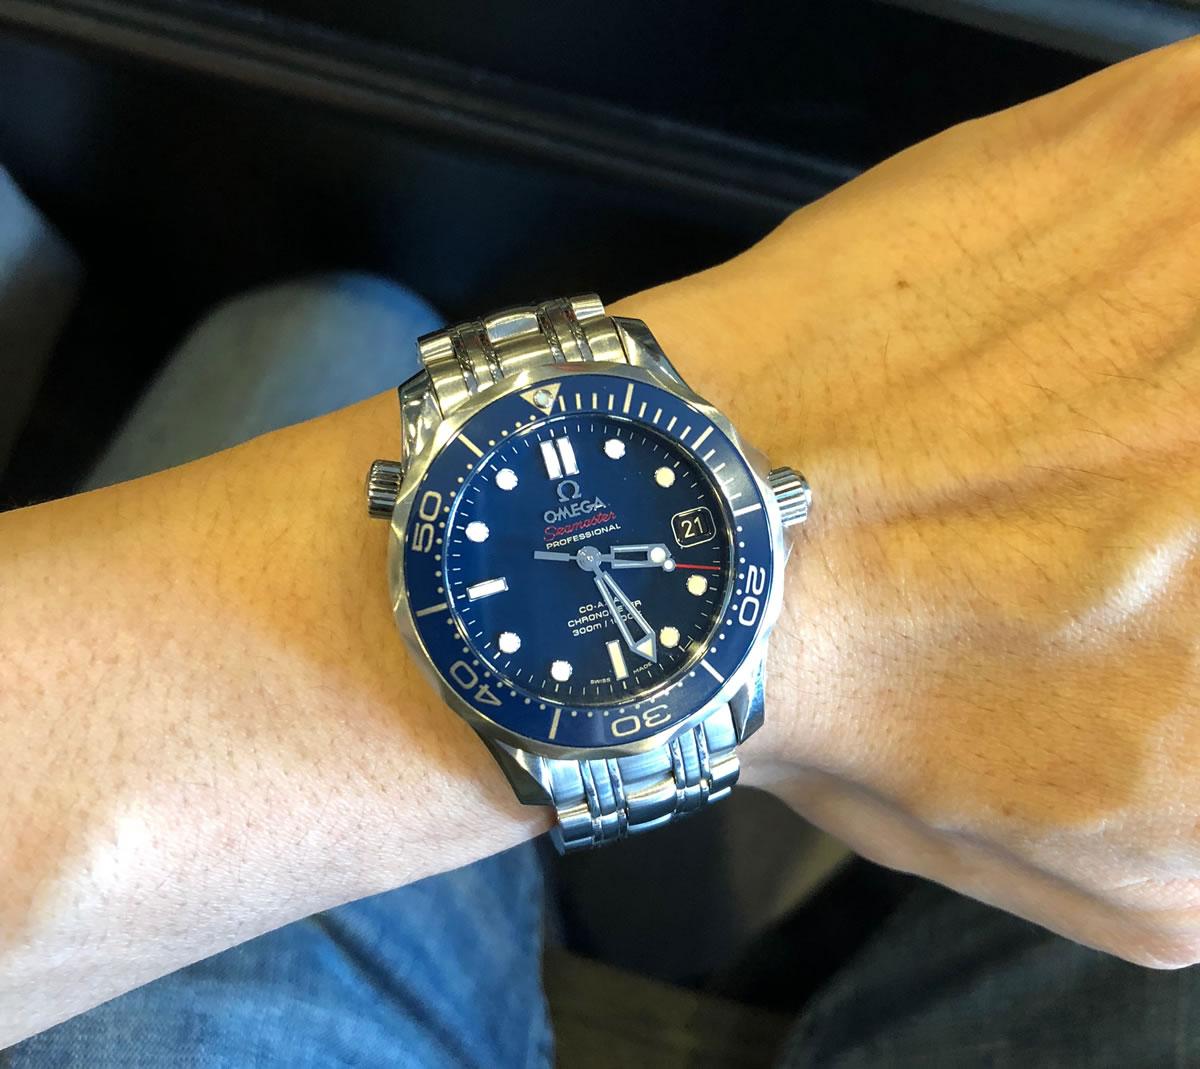 Omega Seamaster SMPc Blue Ceramic 212.30.36.20.03.001